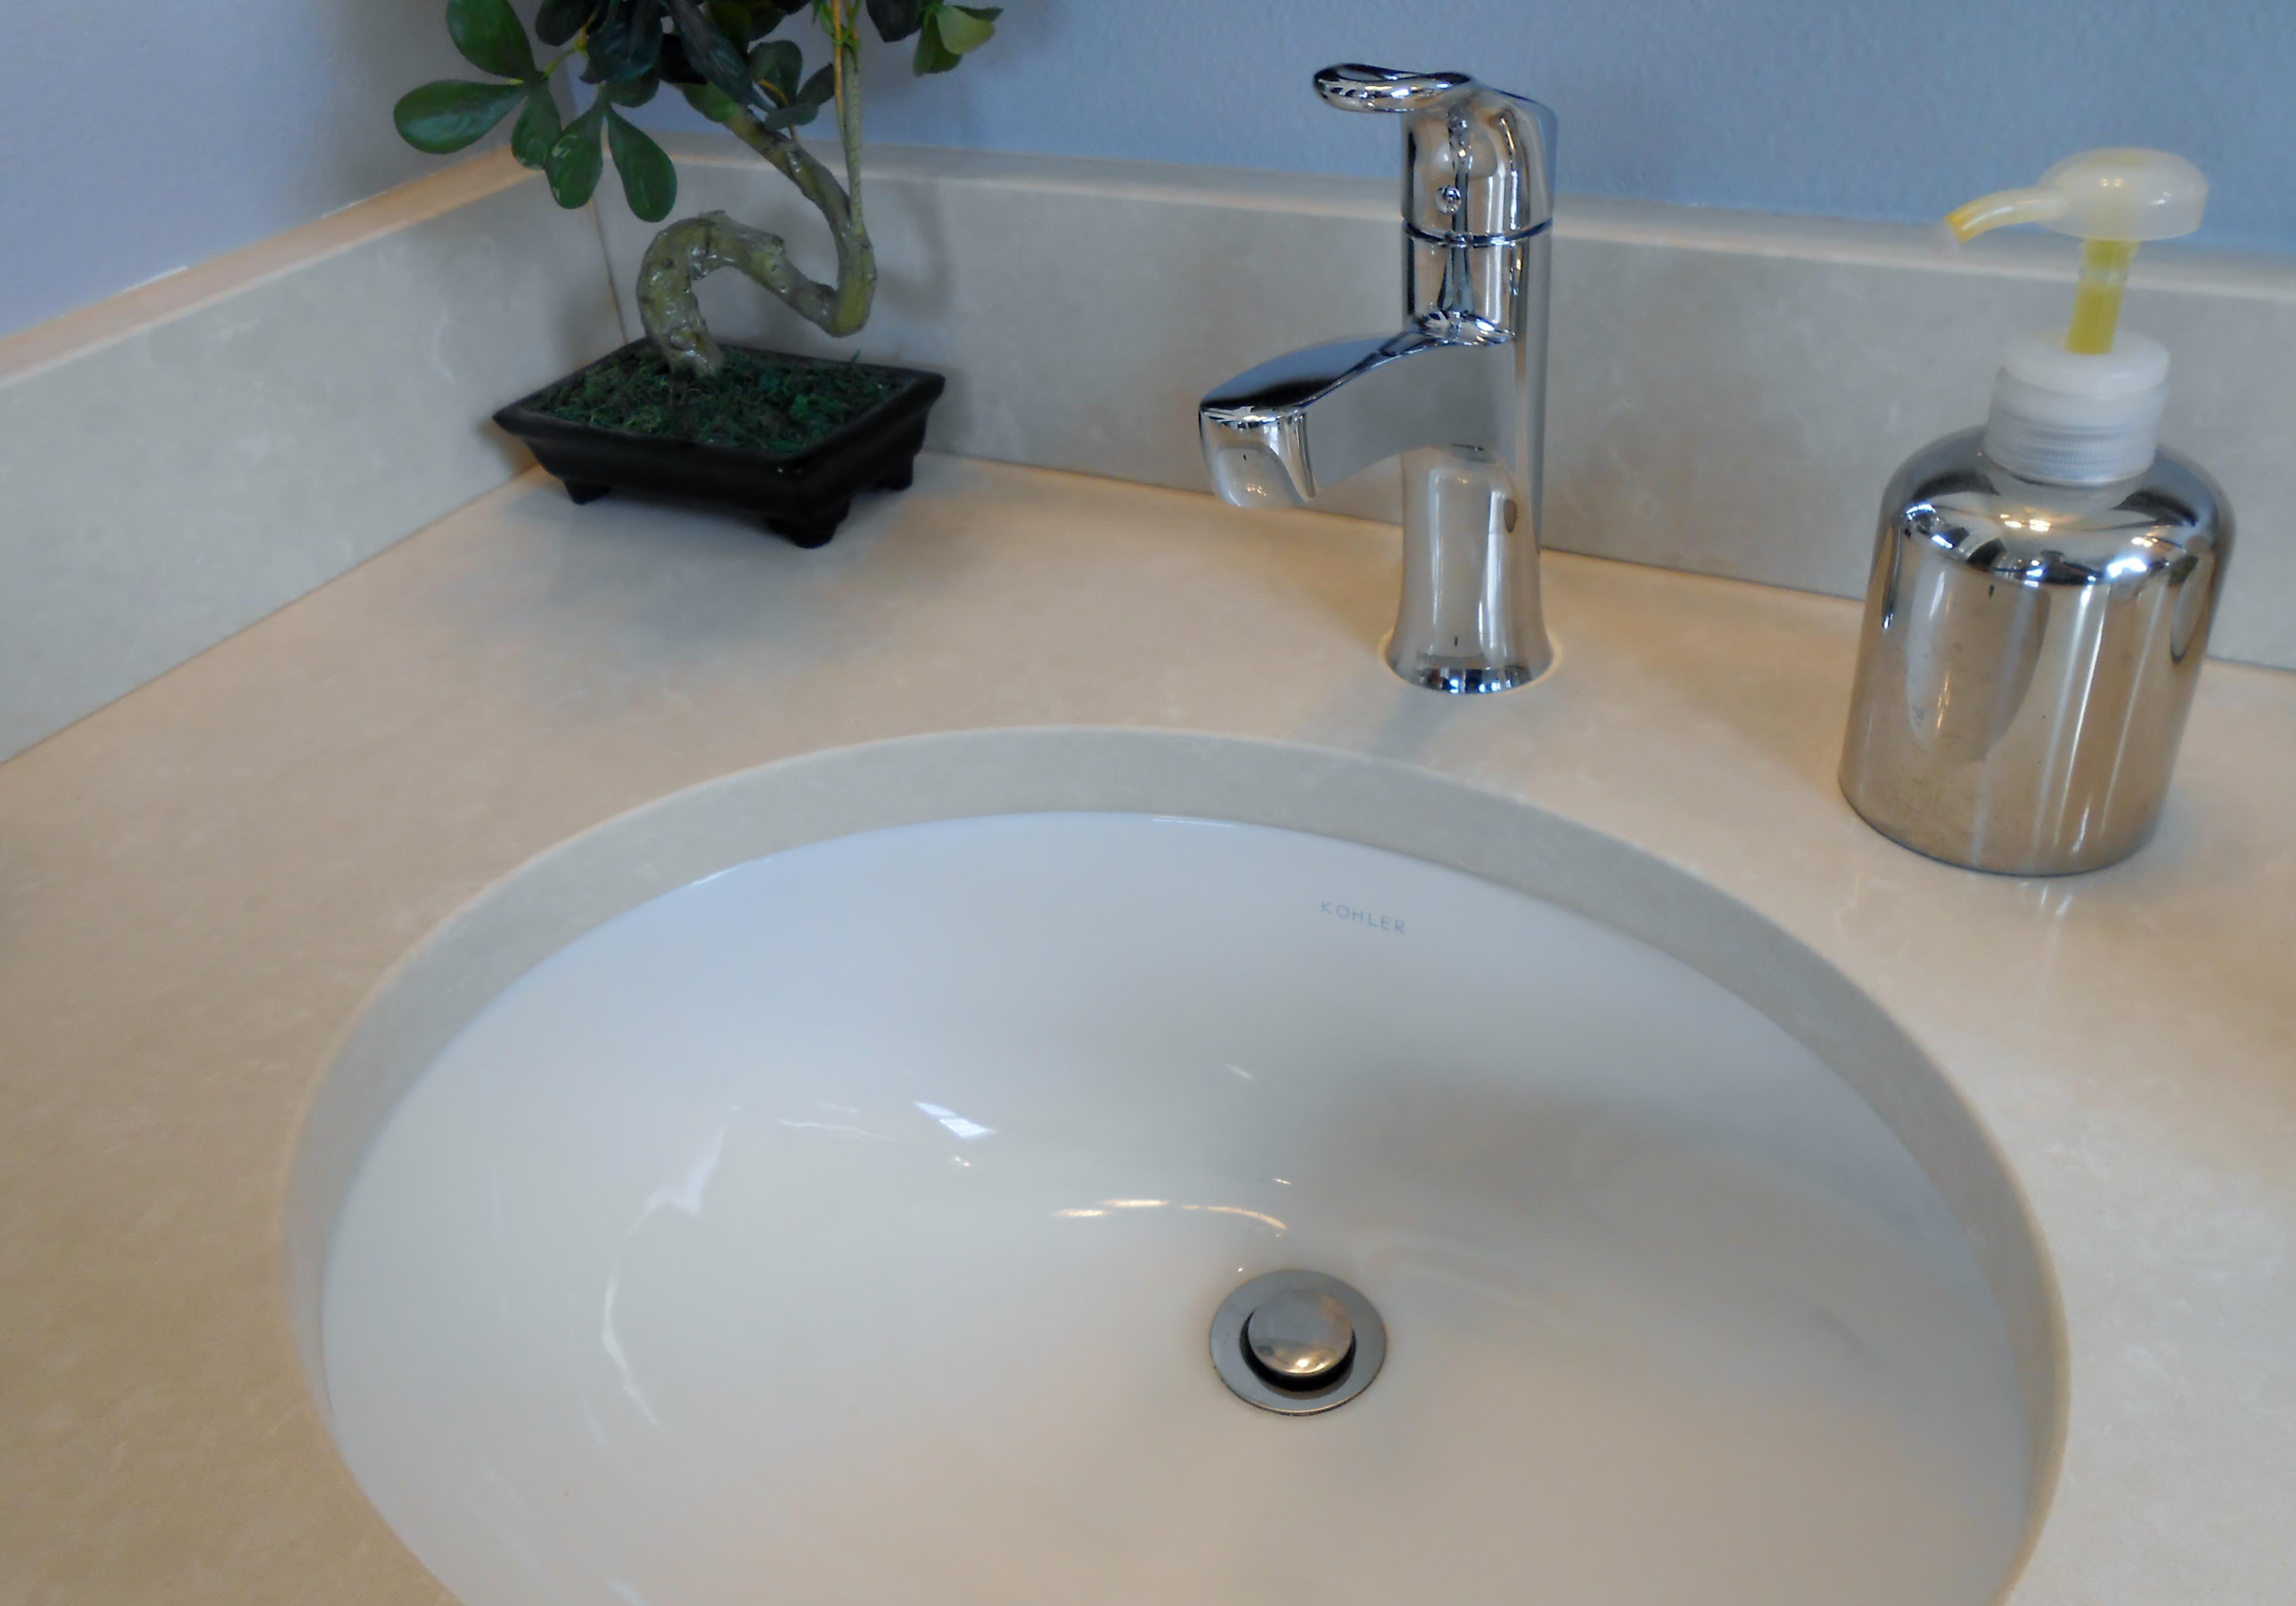 chrome plumbing fixture and undermount sink